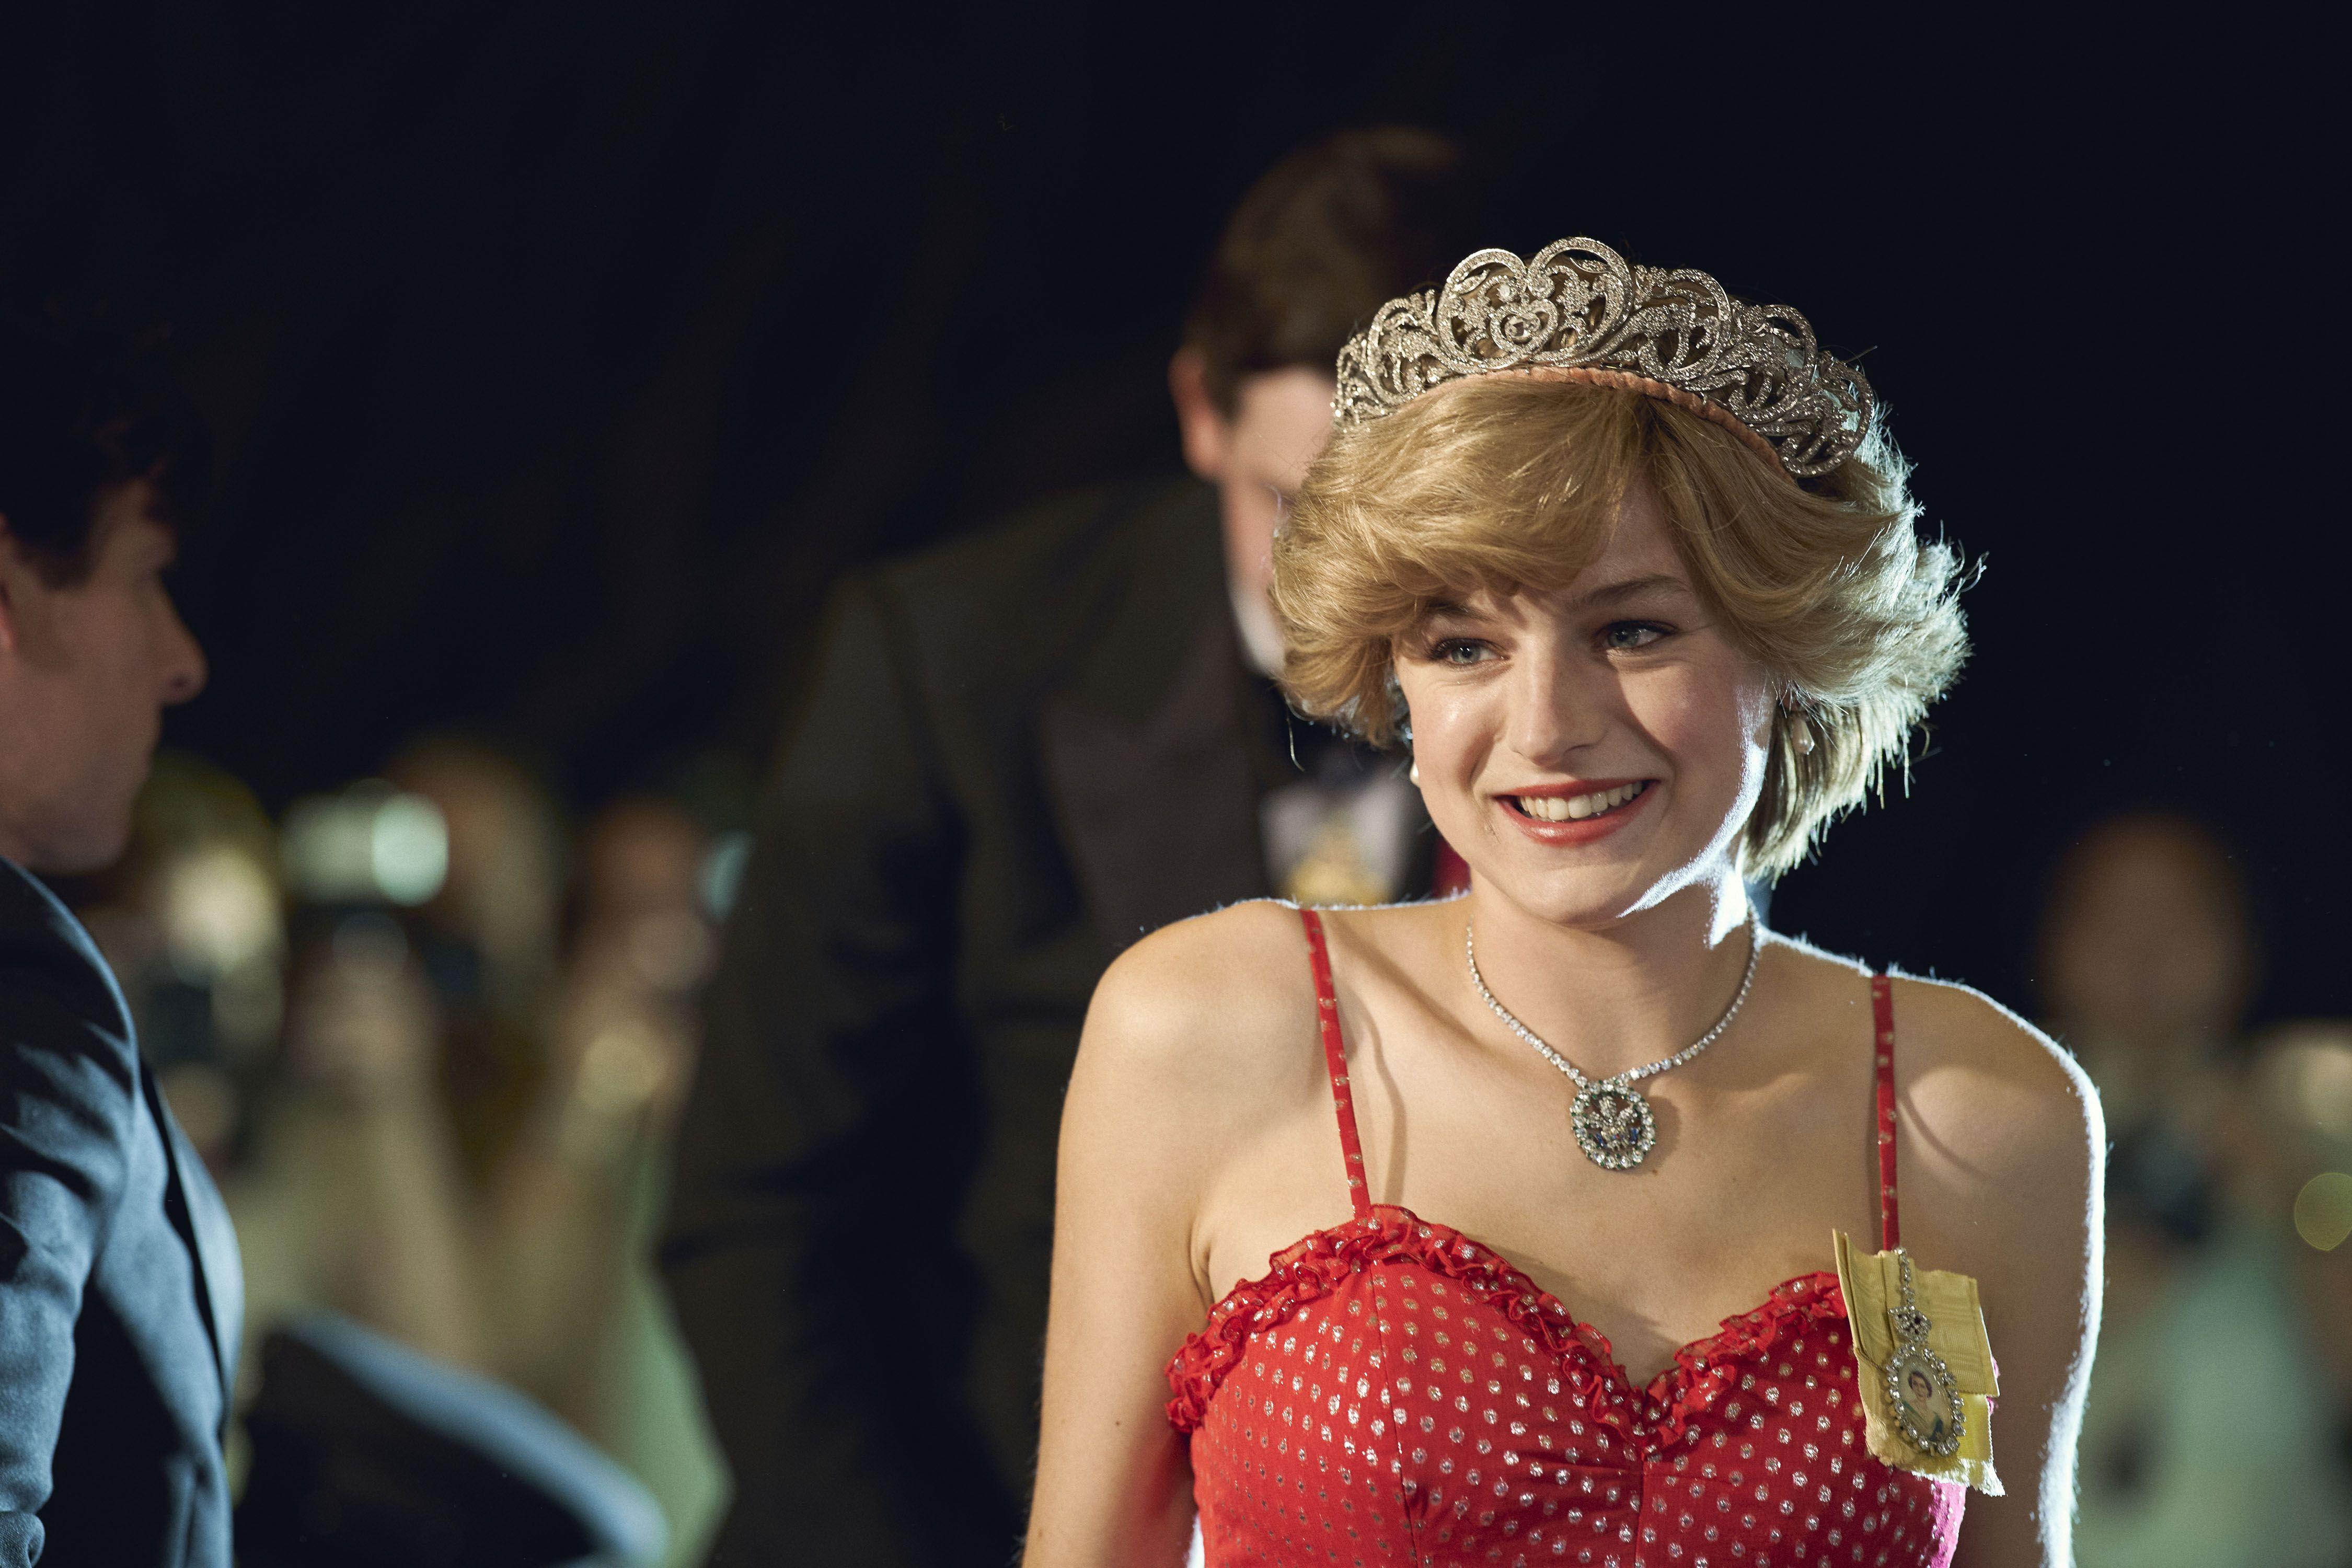 Emma Corrin as Princess Diana in The Crown, Season 4